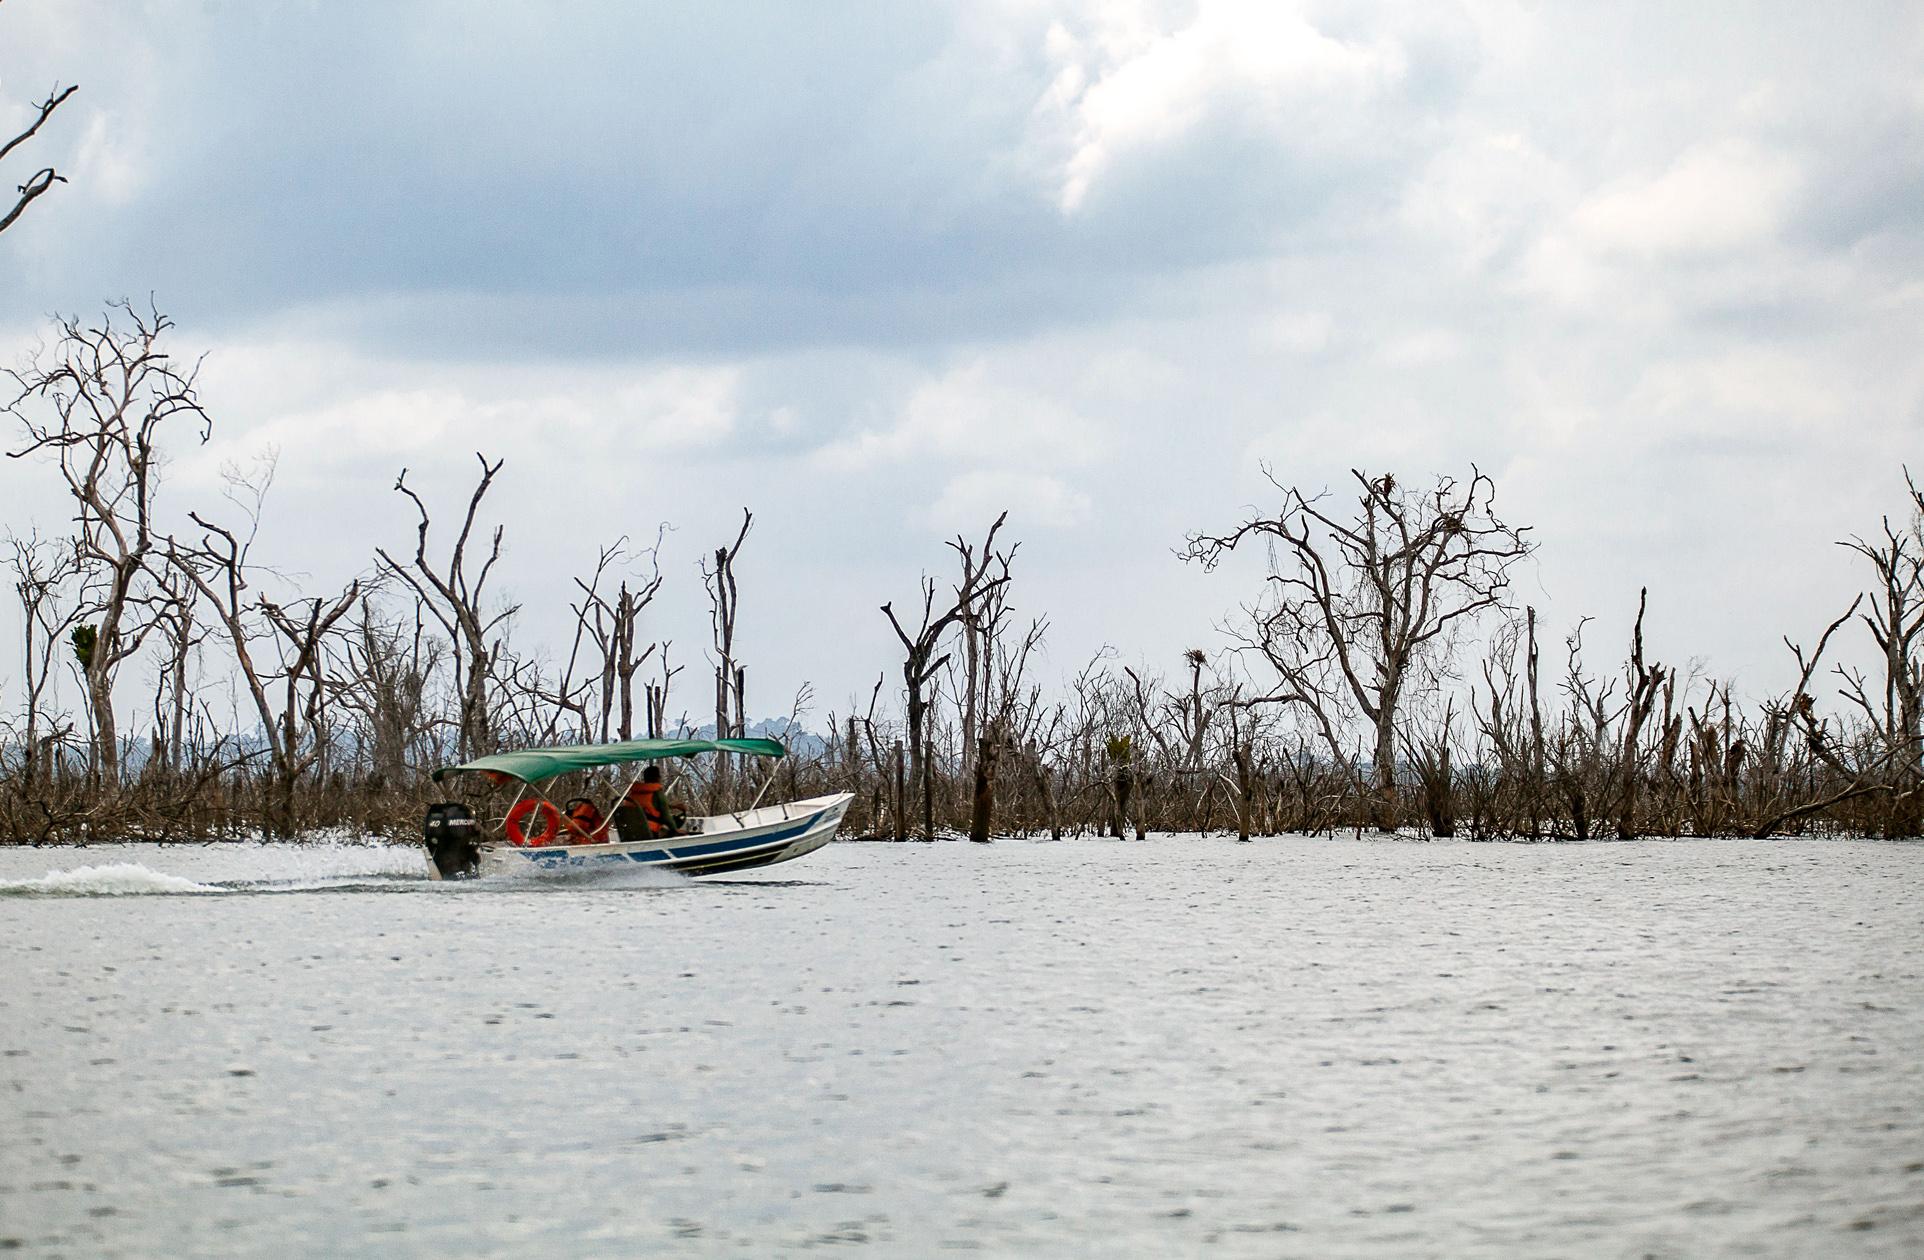 O custo de Belo Monte